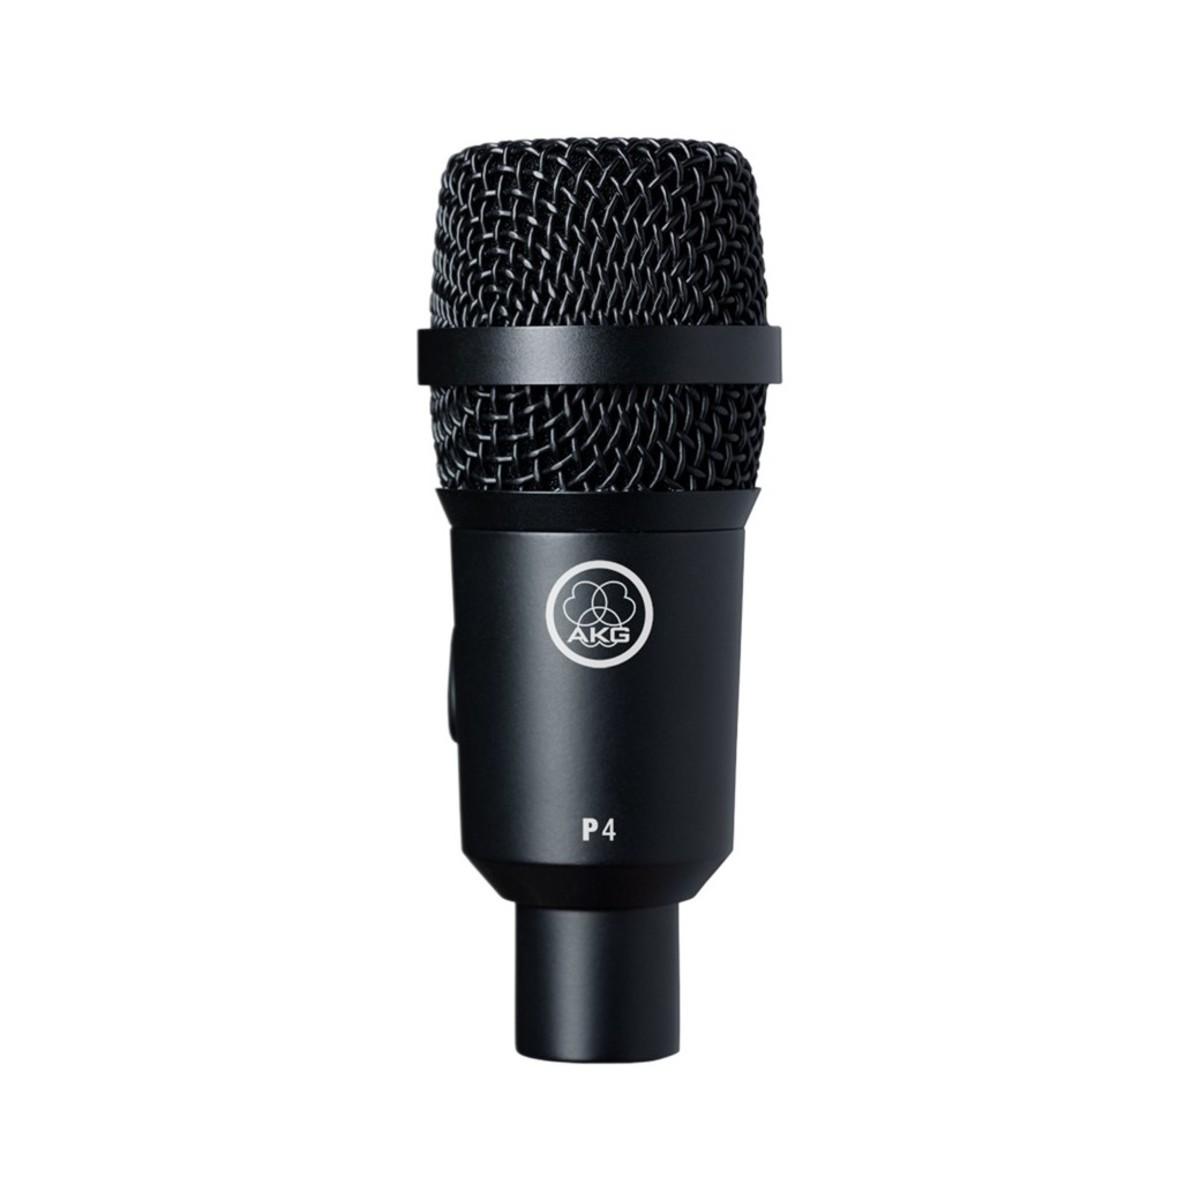 beyerdynamic mikrofon M 58 Dynamisk reportasjemikrofon